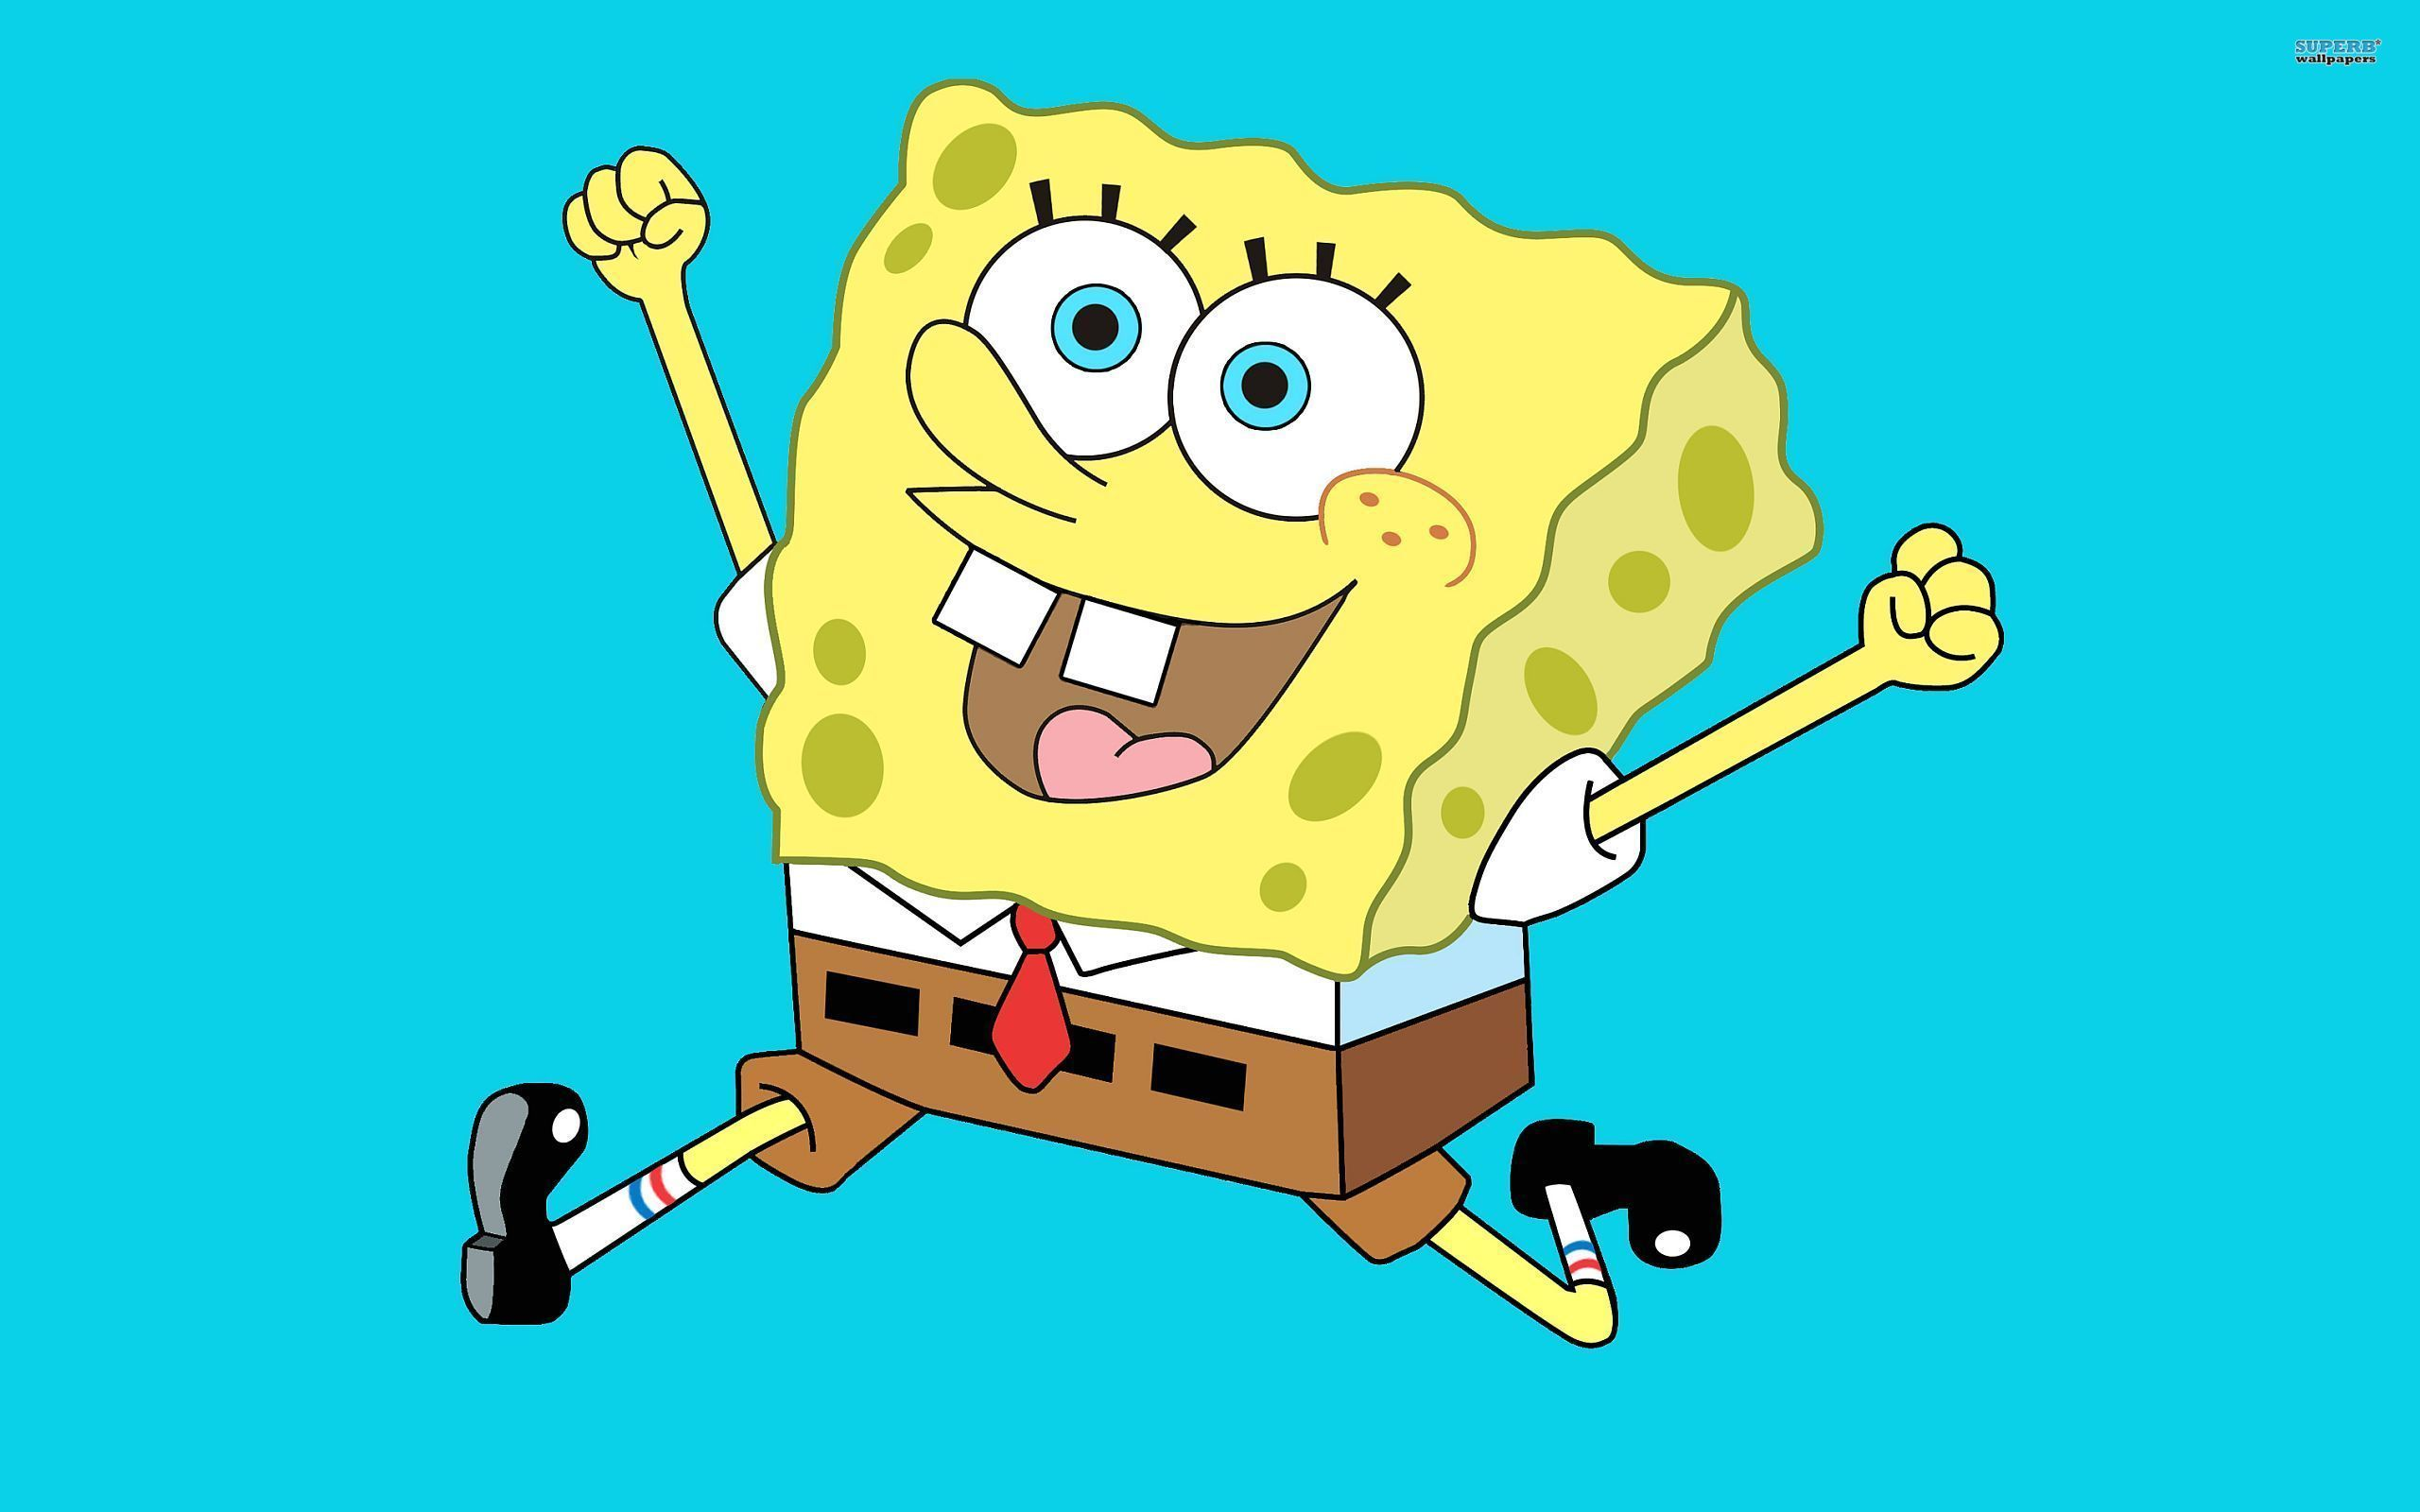 Spongebob wallpaper spongebob squarepants 40604031 2560 1600